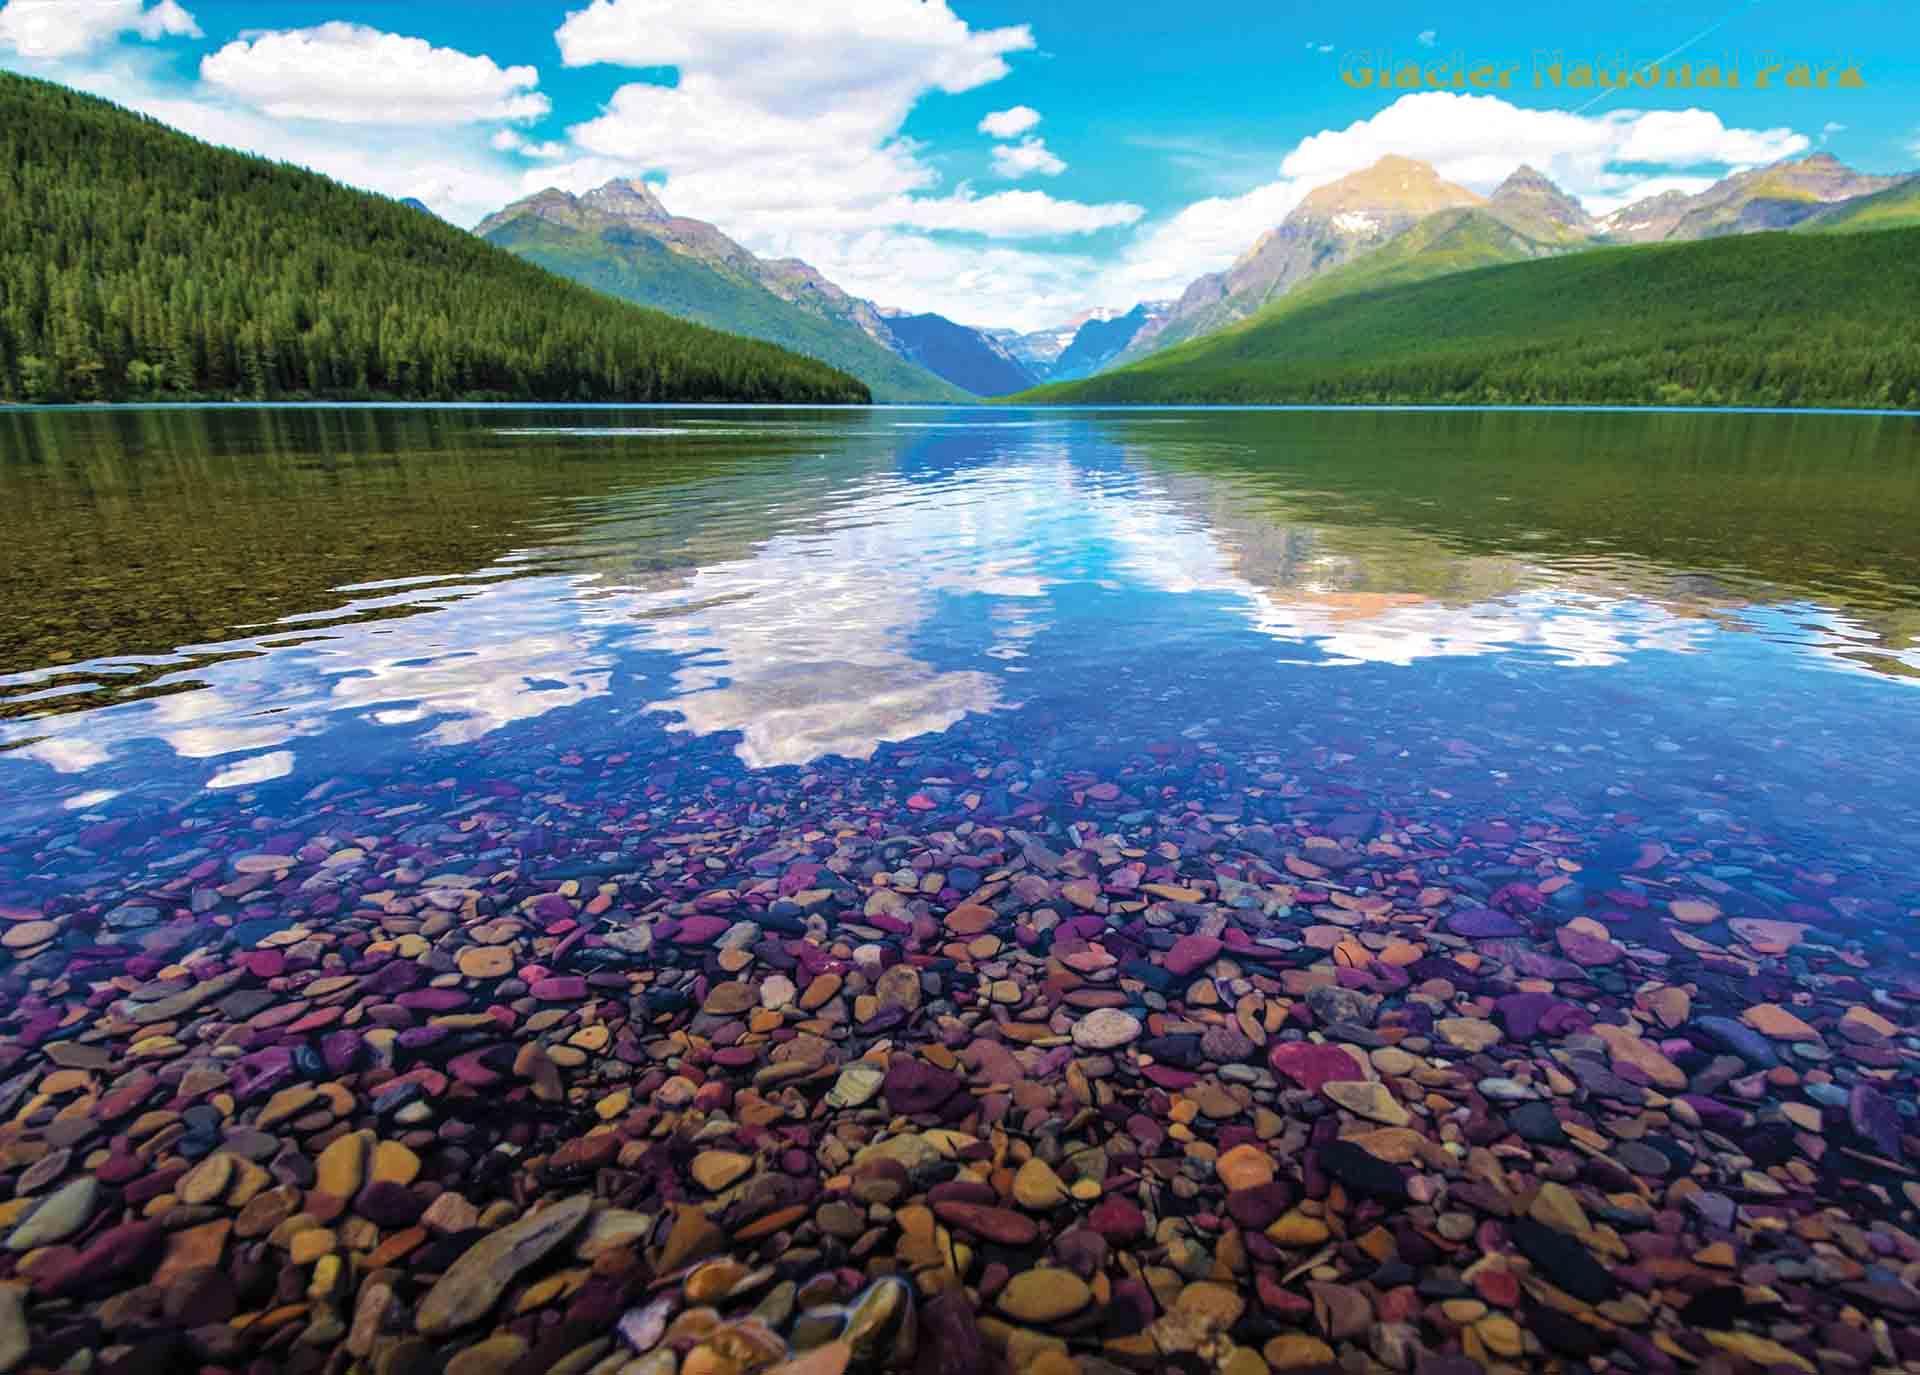 Glacier National Park Bowman Lake, adult jigsaw puzzle